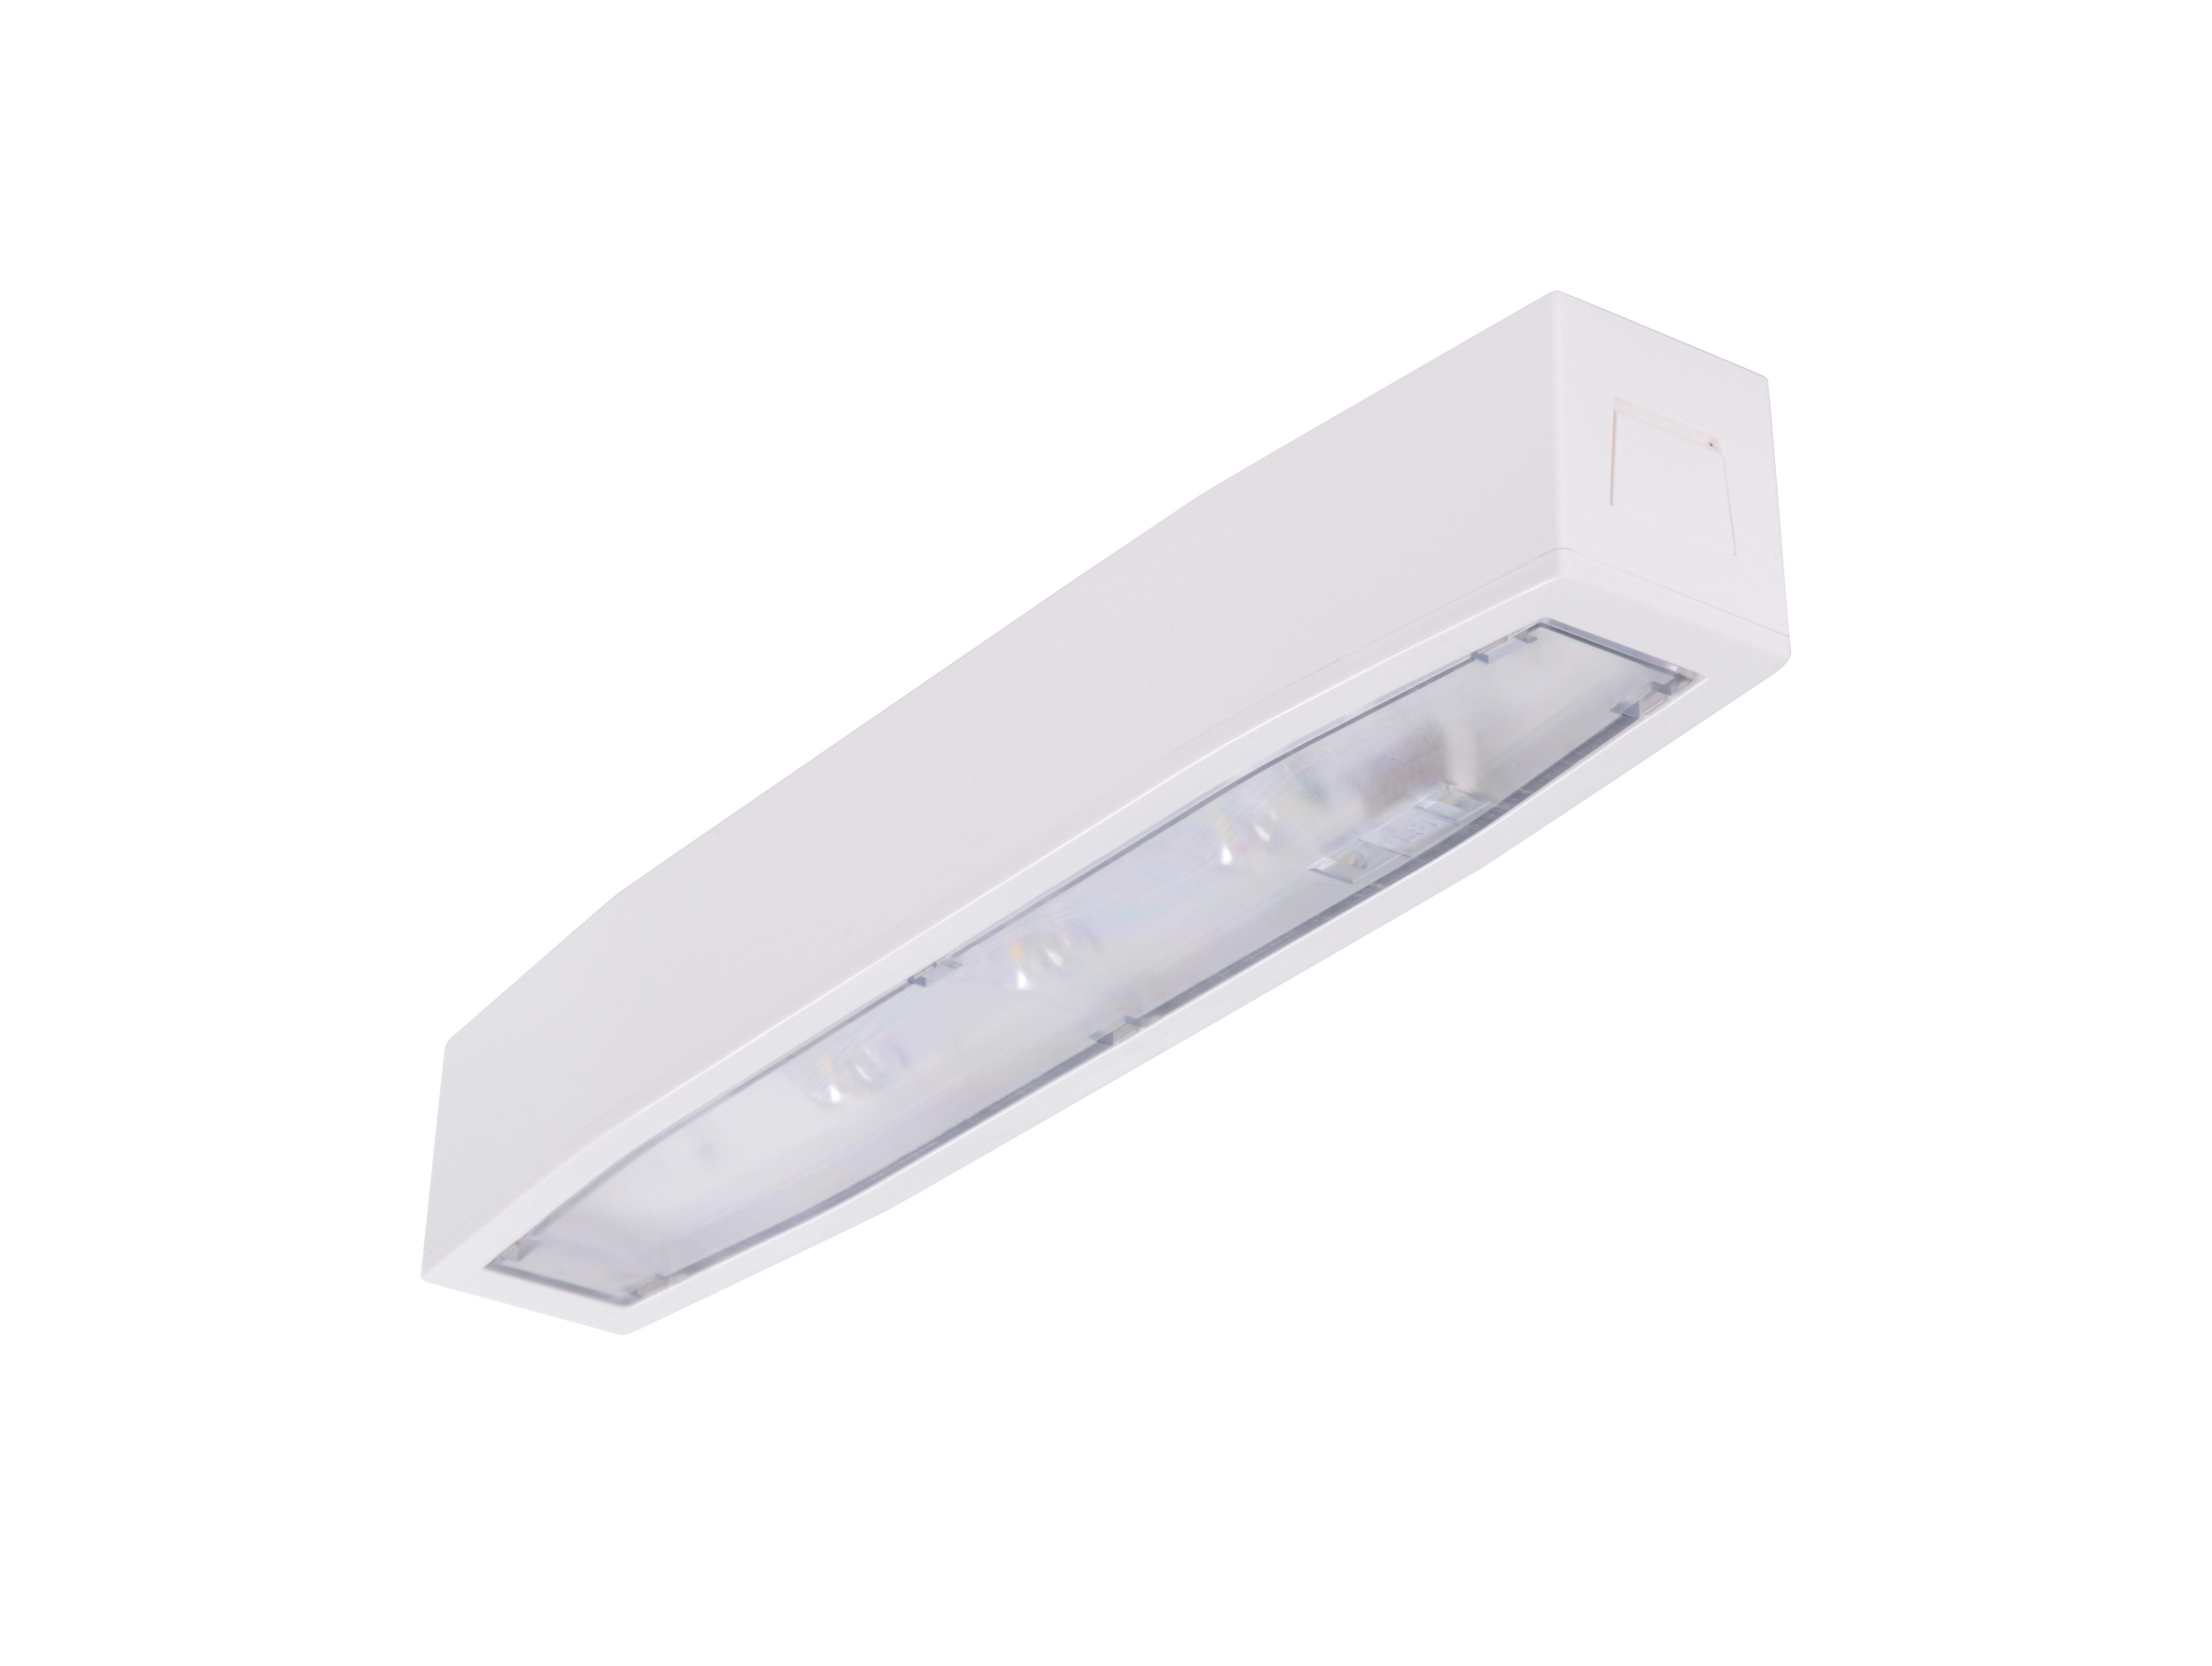 Lampa antipanica led Intelight 94710   3h mentinut test automat 0